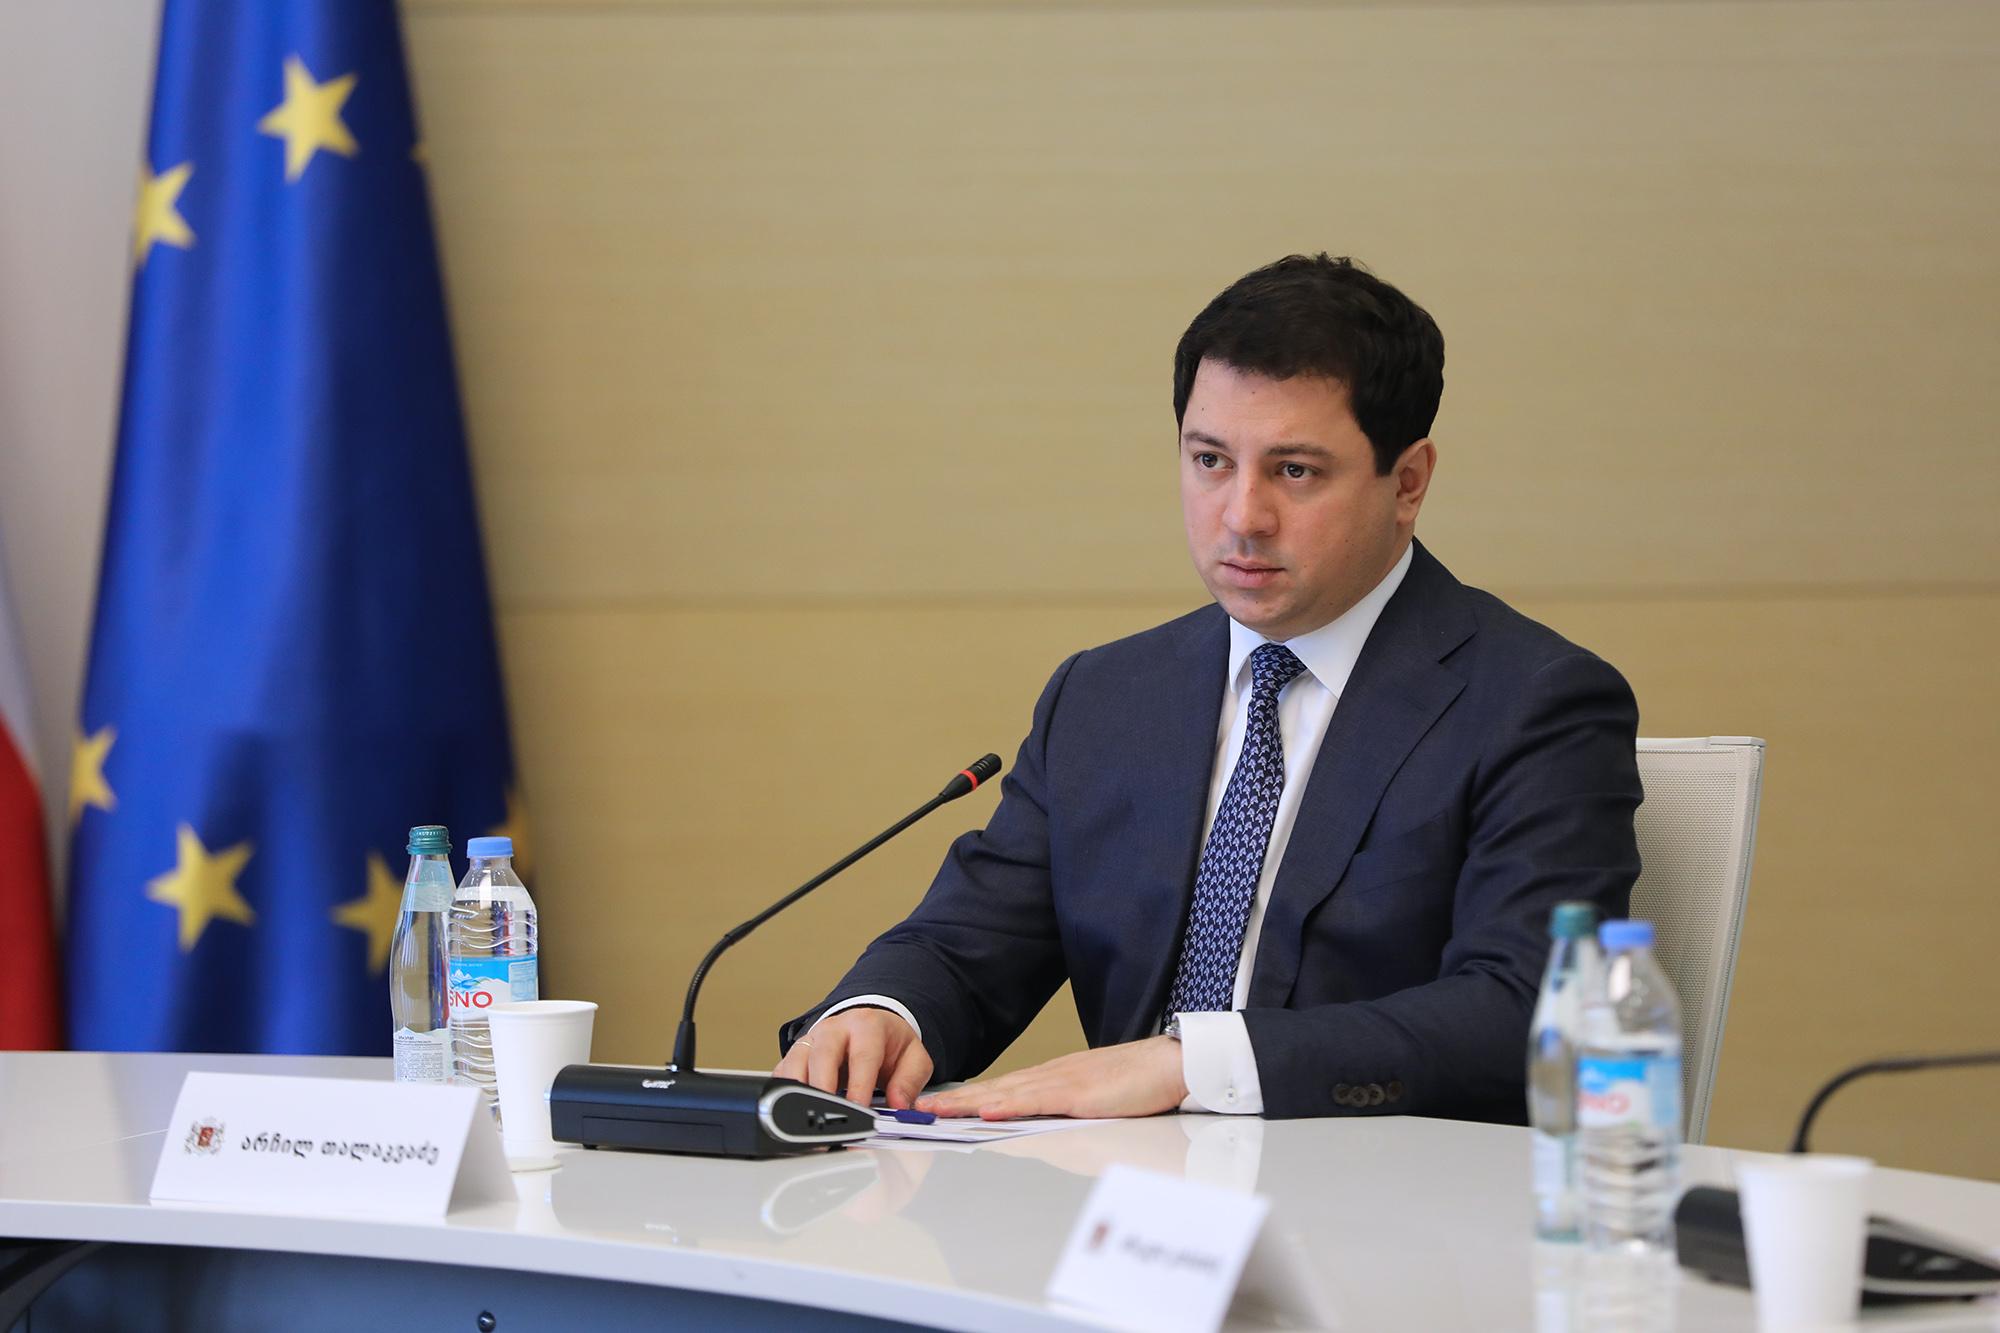 Archil Talakvadze 14 инвестиционный климат Грузии инвестиционный климат Грузии